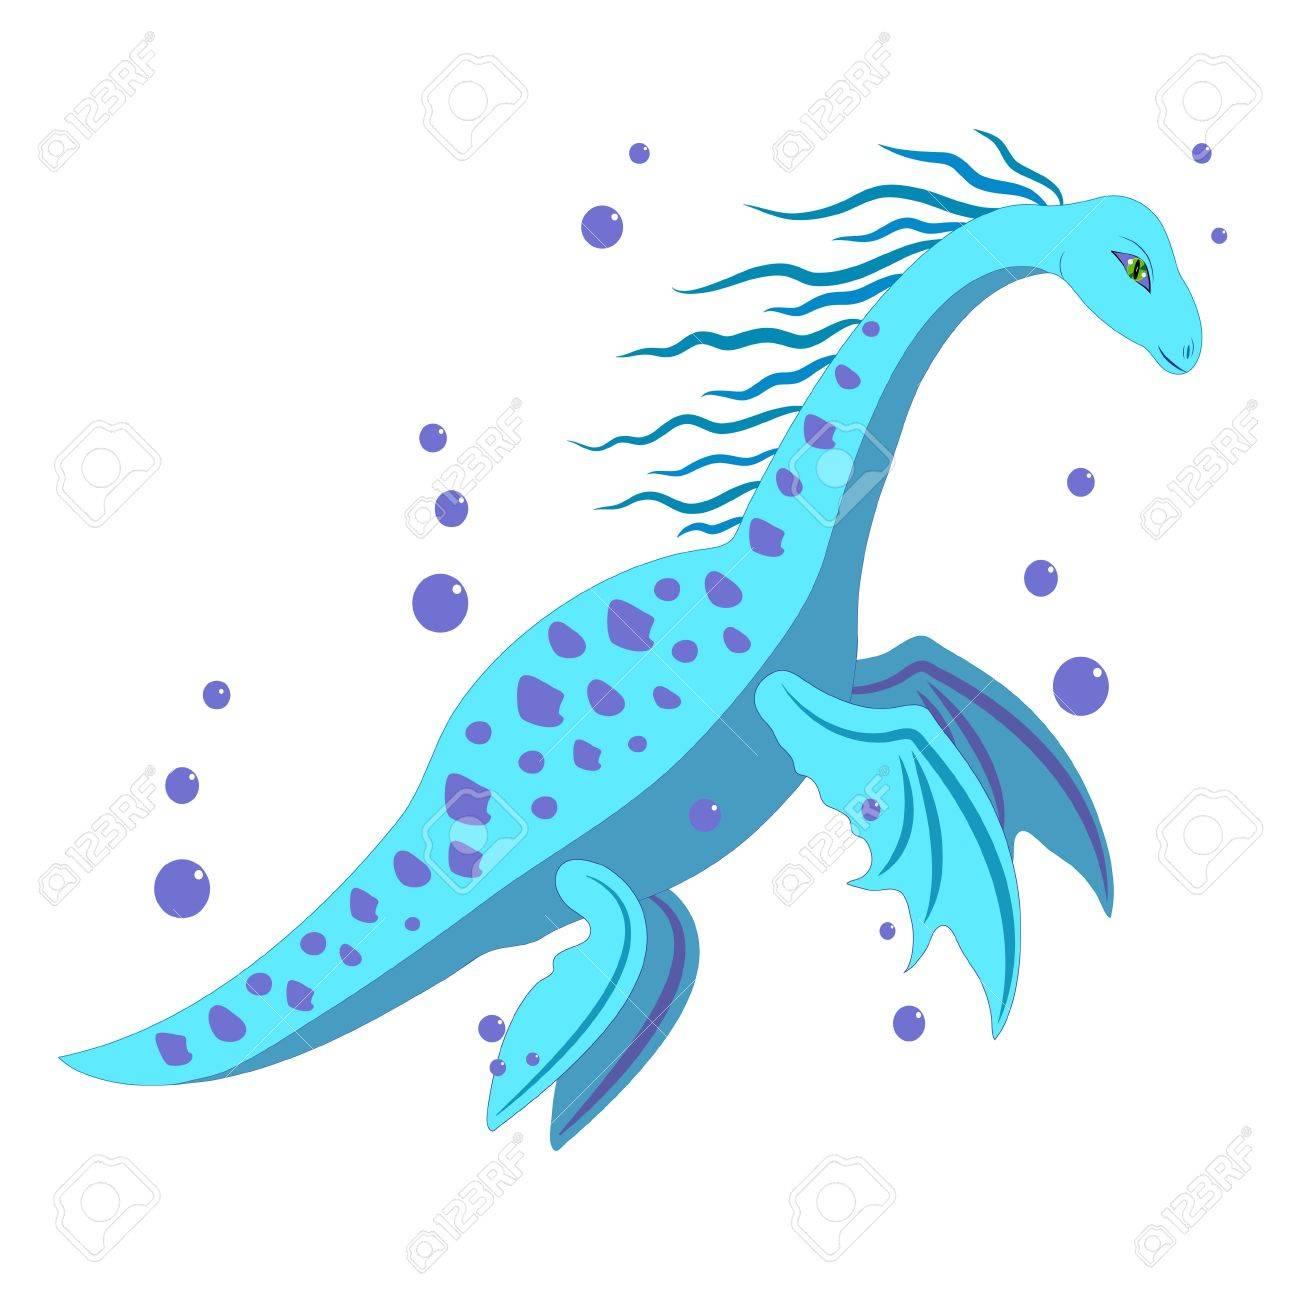 water dinosaur. Stock Vector - 10594747